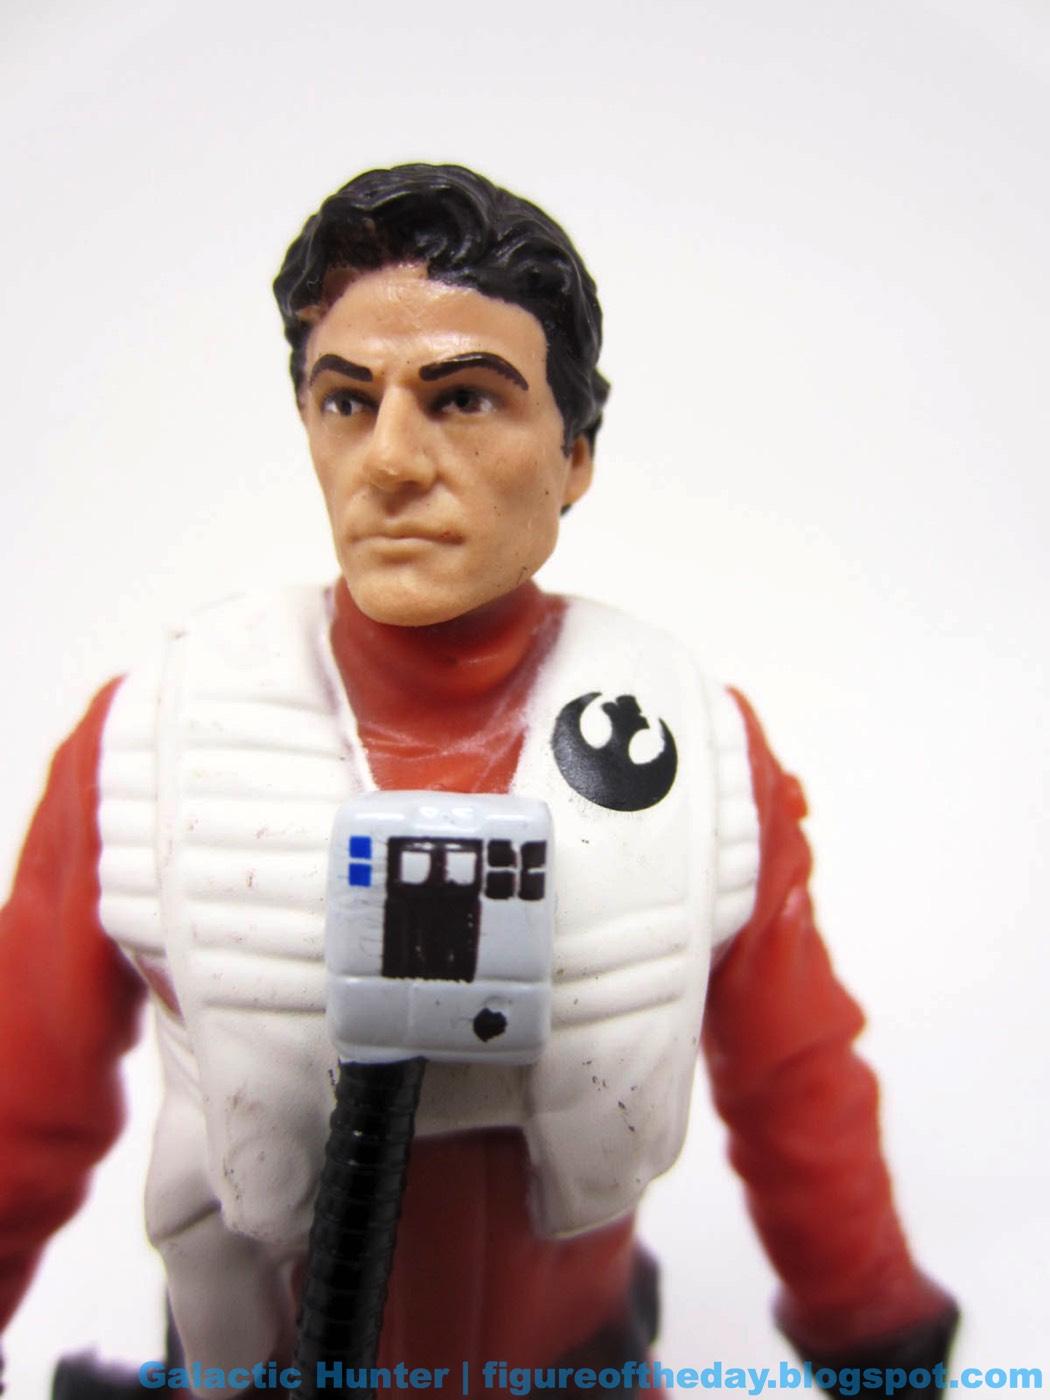 Resistance Pilot The Last Jedi Poe Dameron Star Wars Force Link Figure 3.75 Inches Hasbro C1507